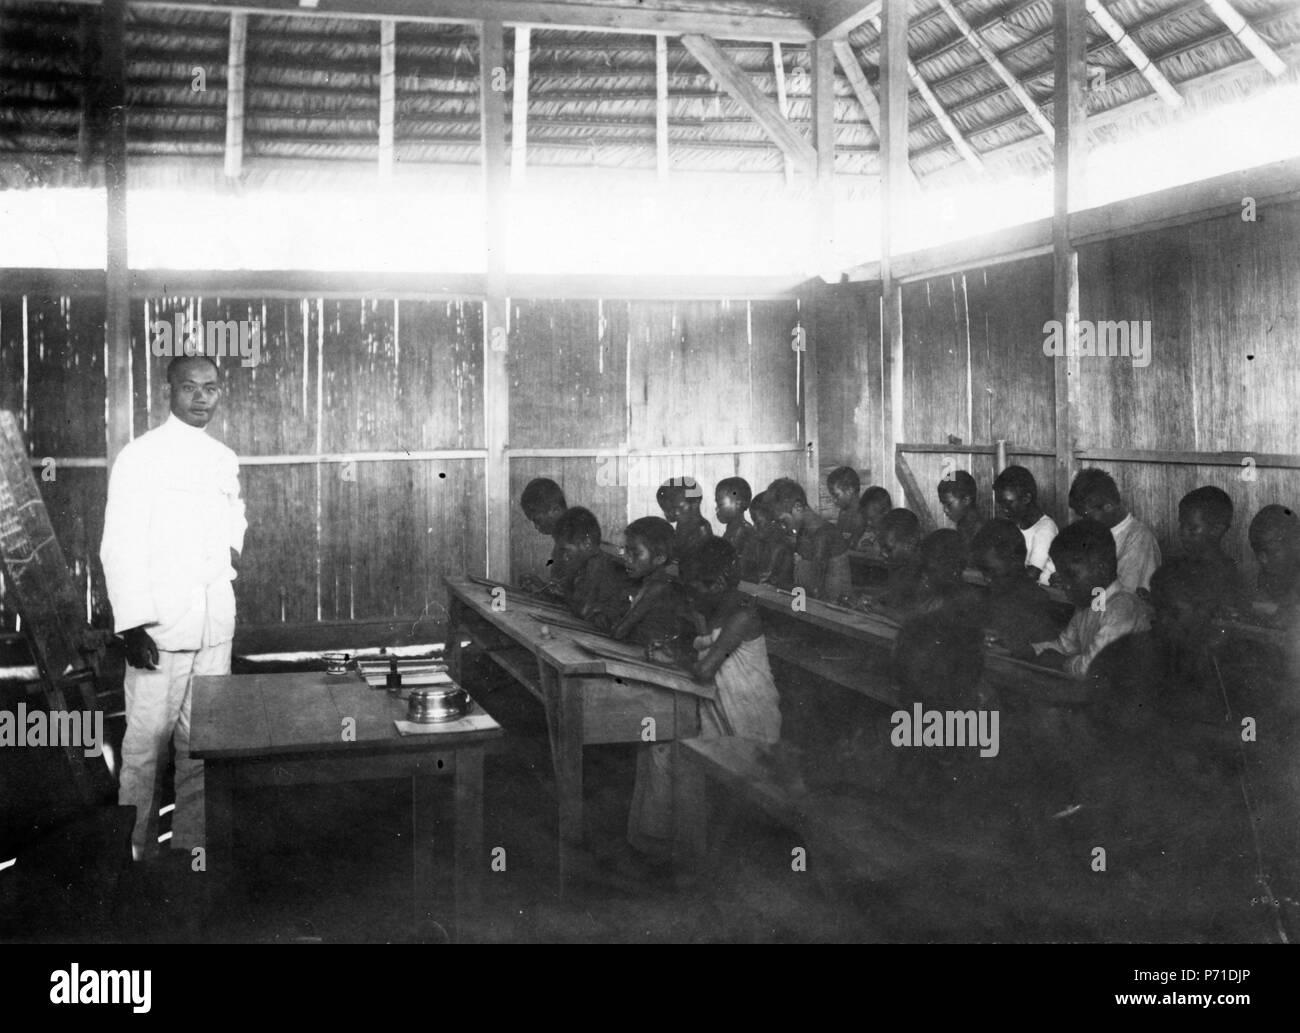 51 Skolsalen. Winatu, Sulawesi. Indonesien - SMVK - 010822b - Stock Image